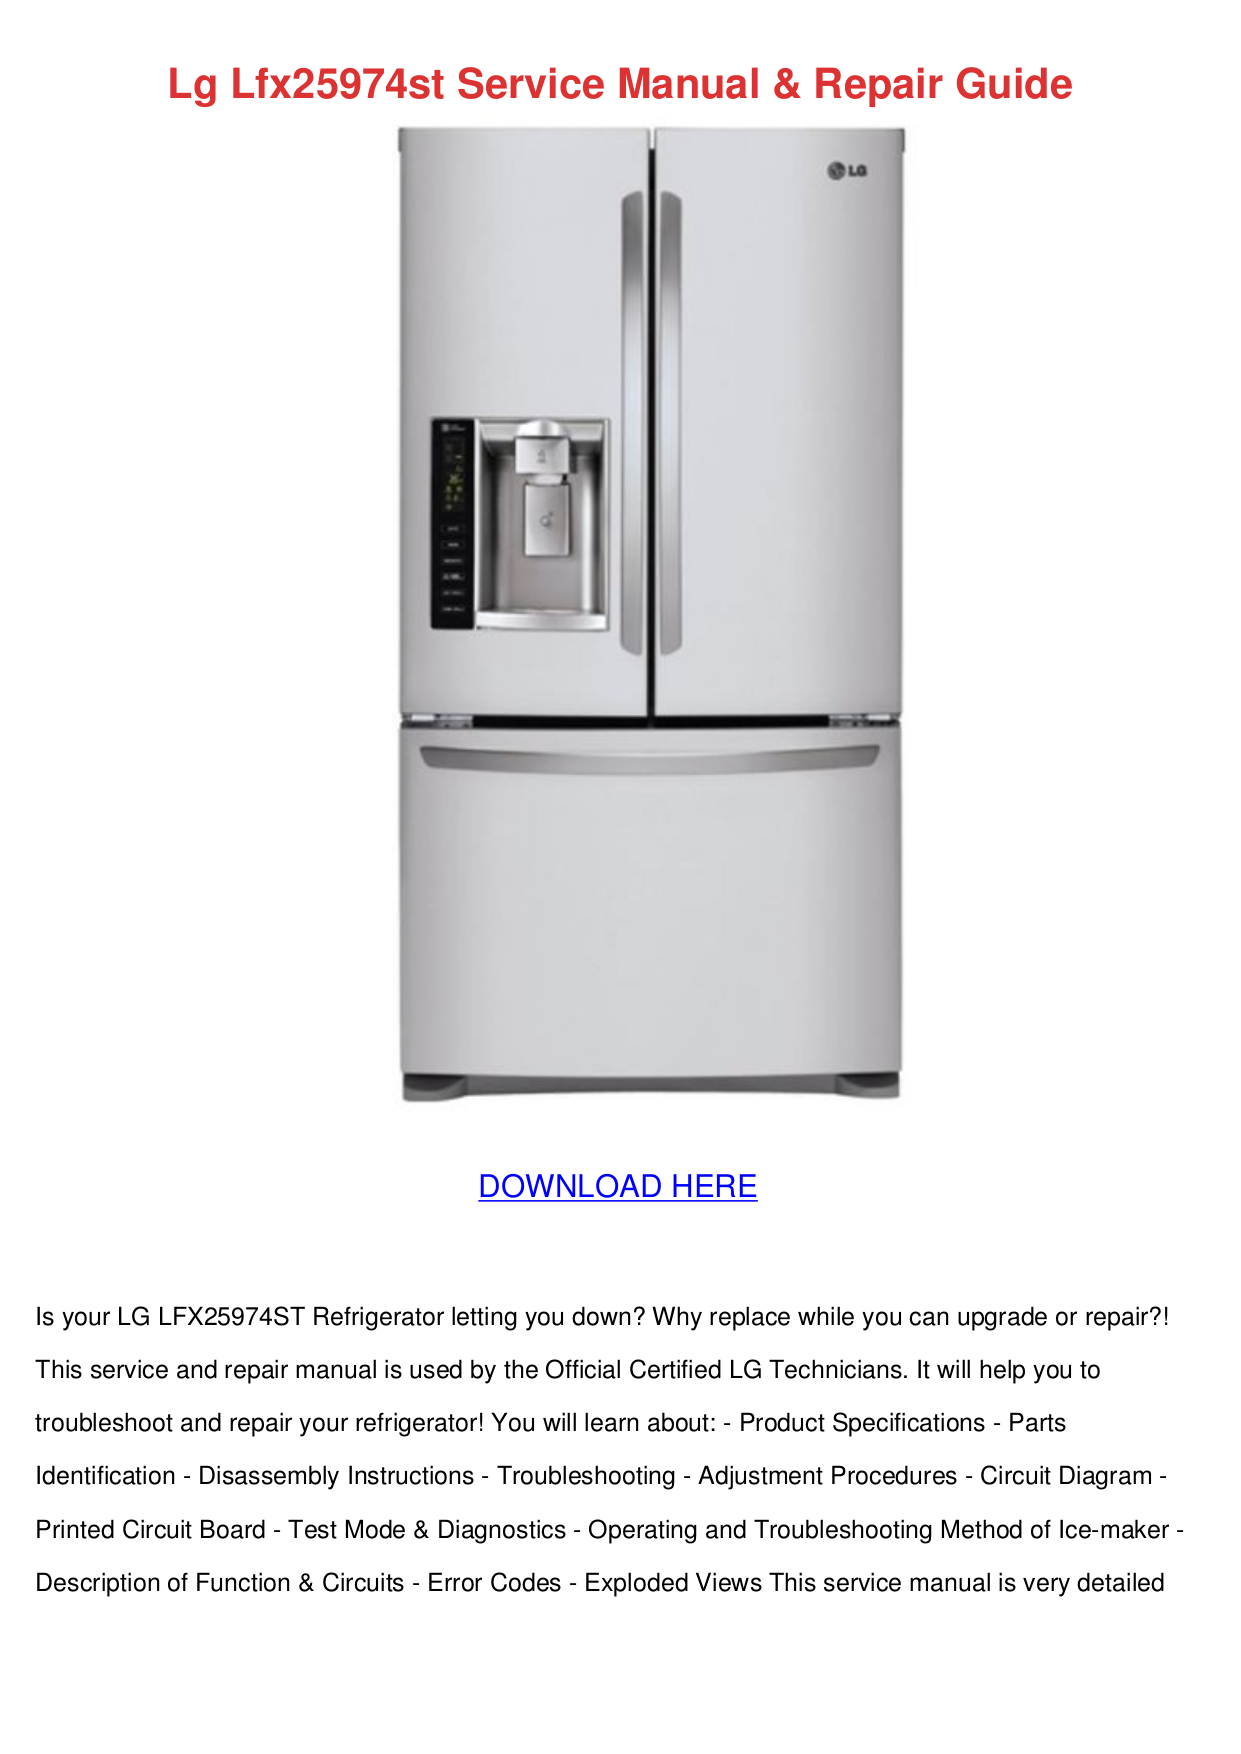 Download Free Pdf For Lg Lfx25974st Refrigerator Manual Schematics